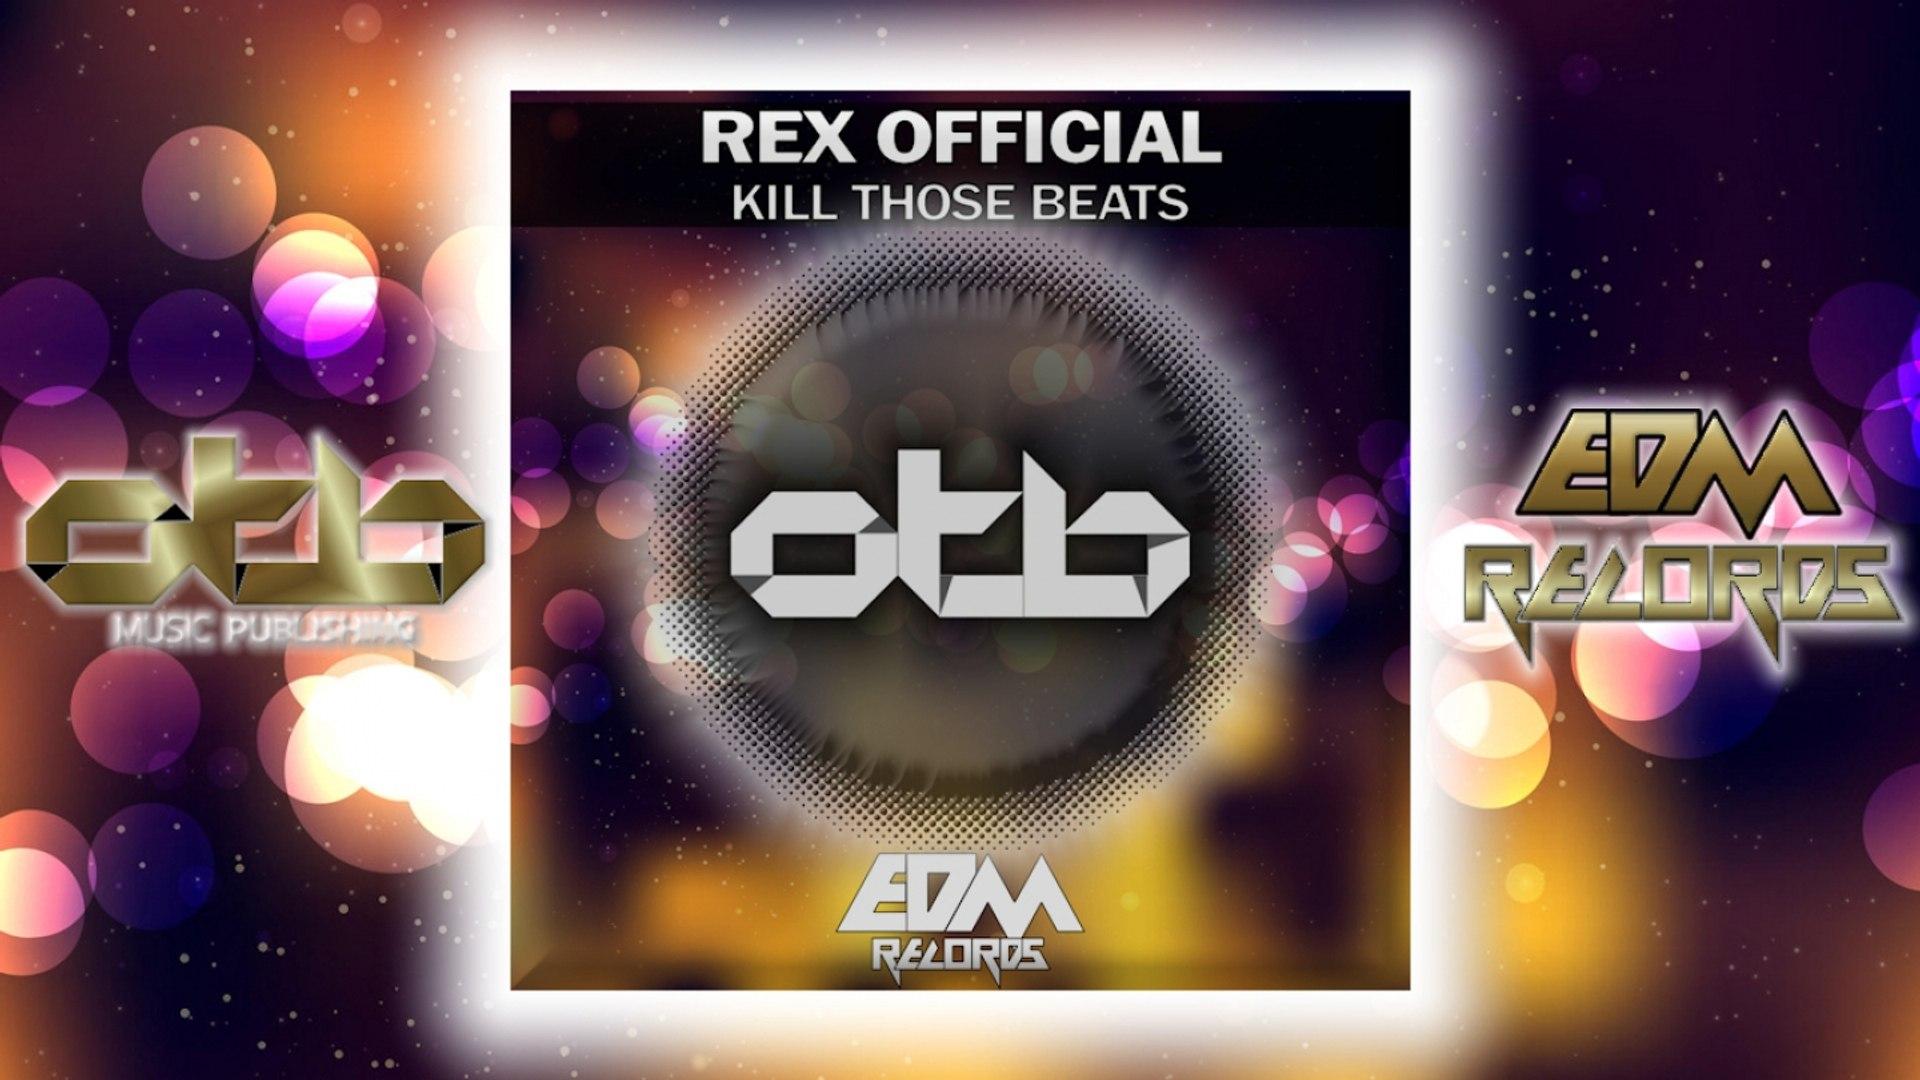 Rex Official - Kill Those Beats - [EDM 2018]